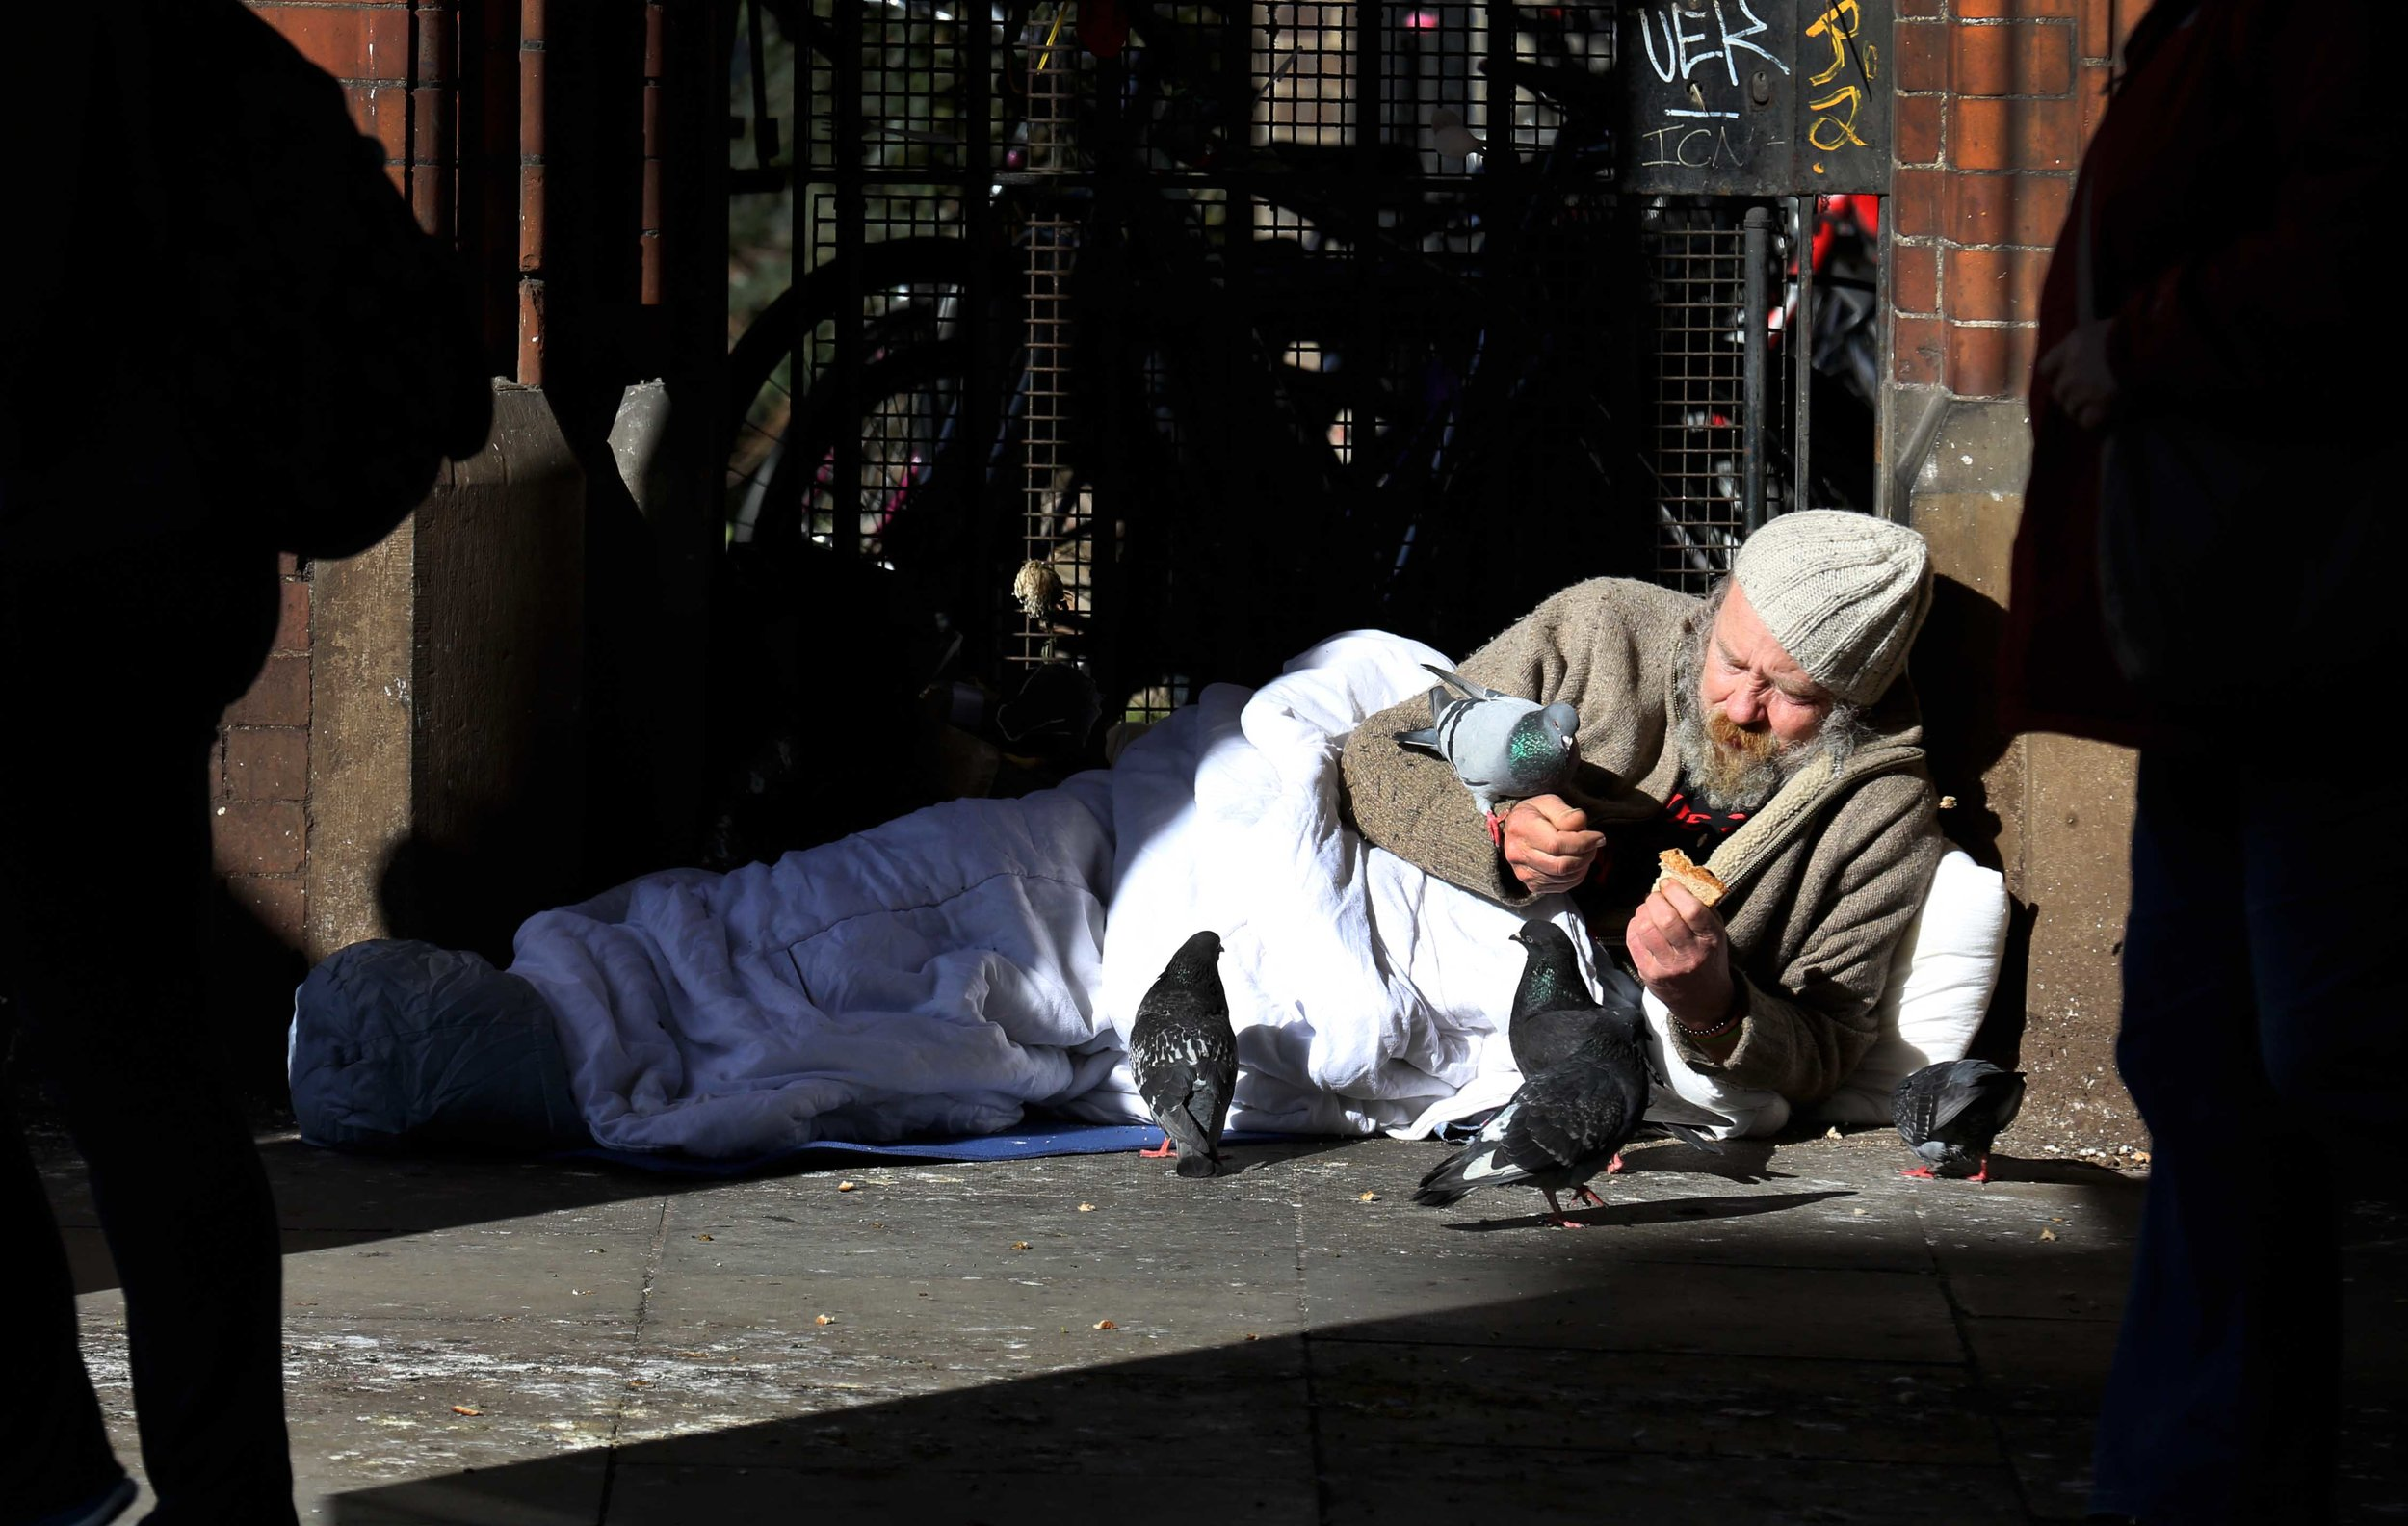 Martin Hart feeds pigeons from his sleeping bag on Westland Row